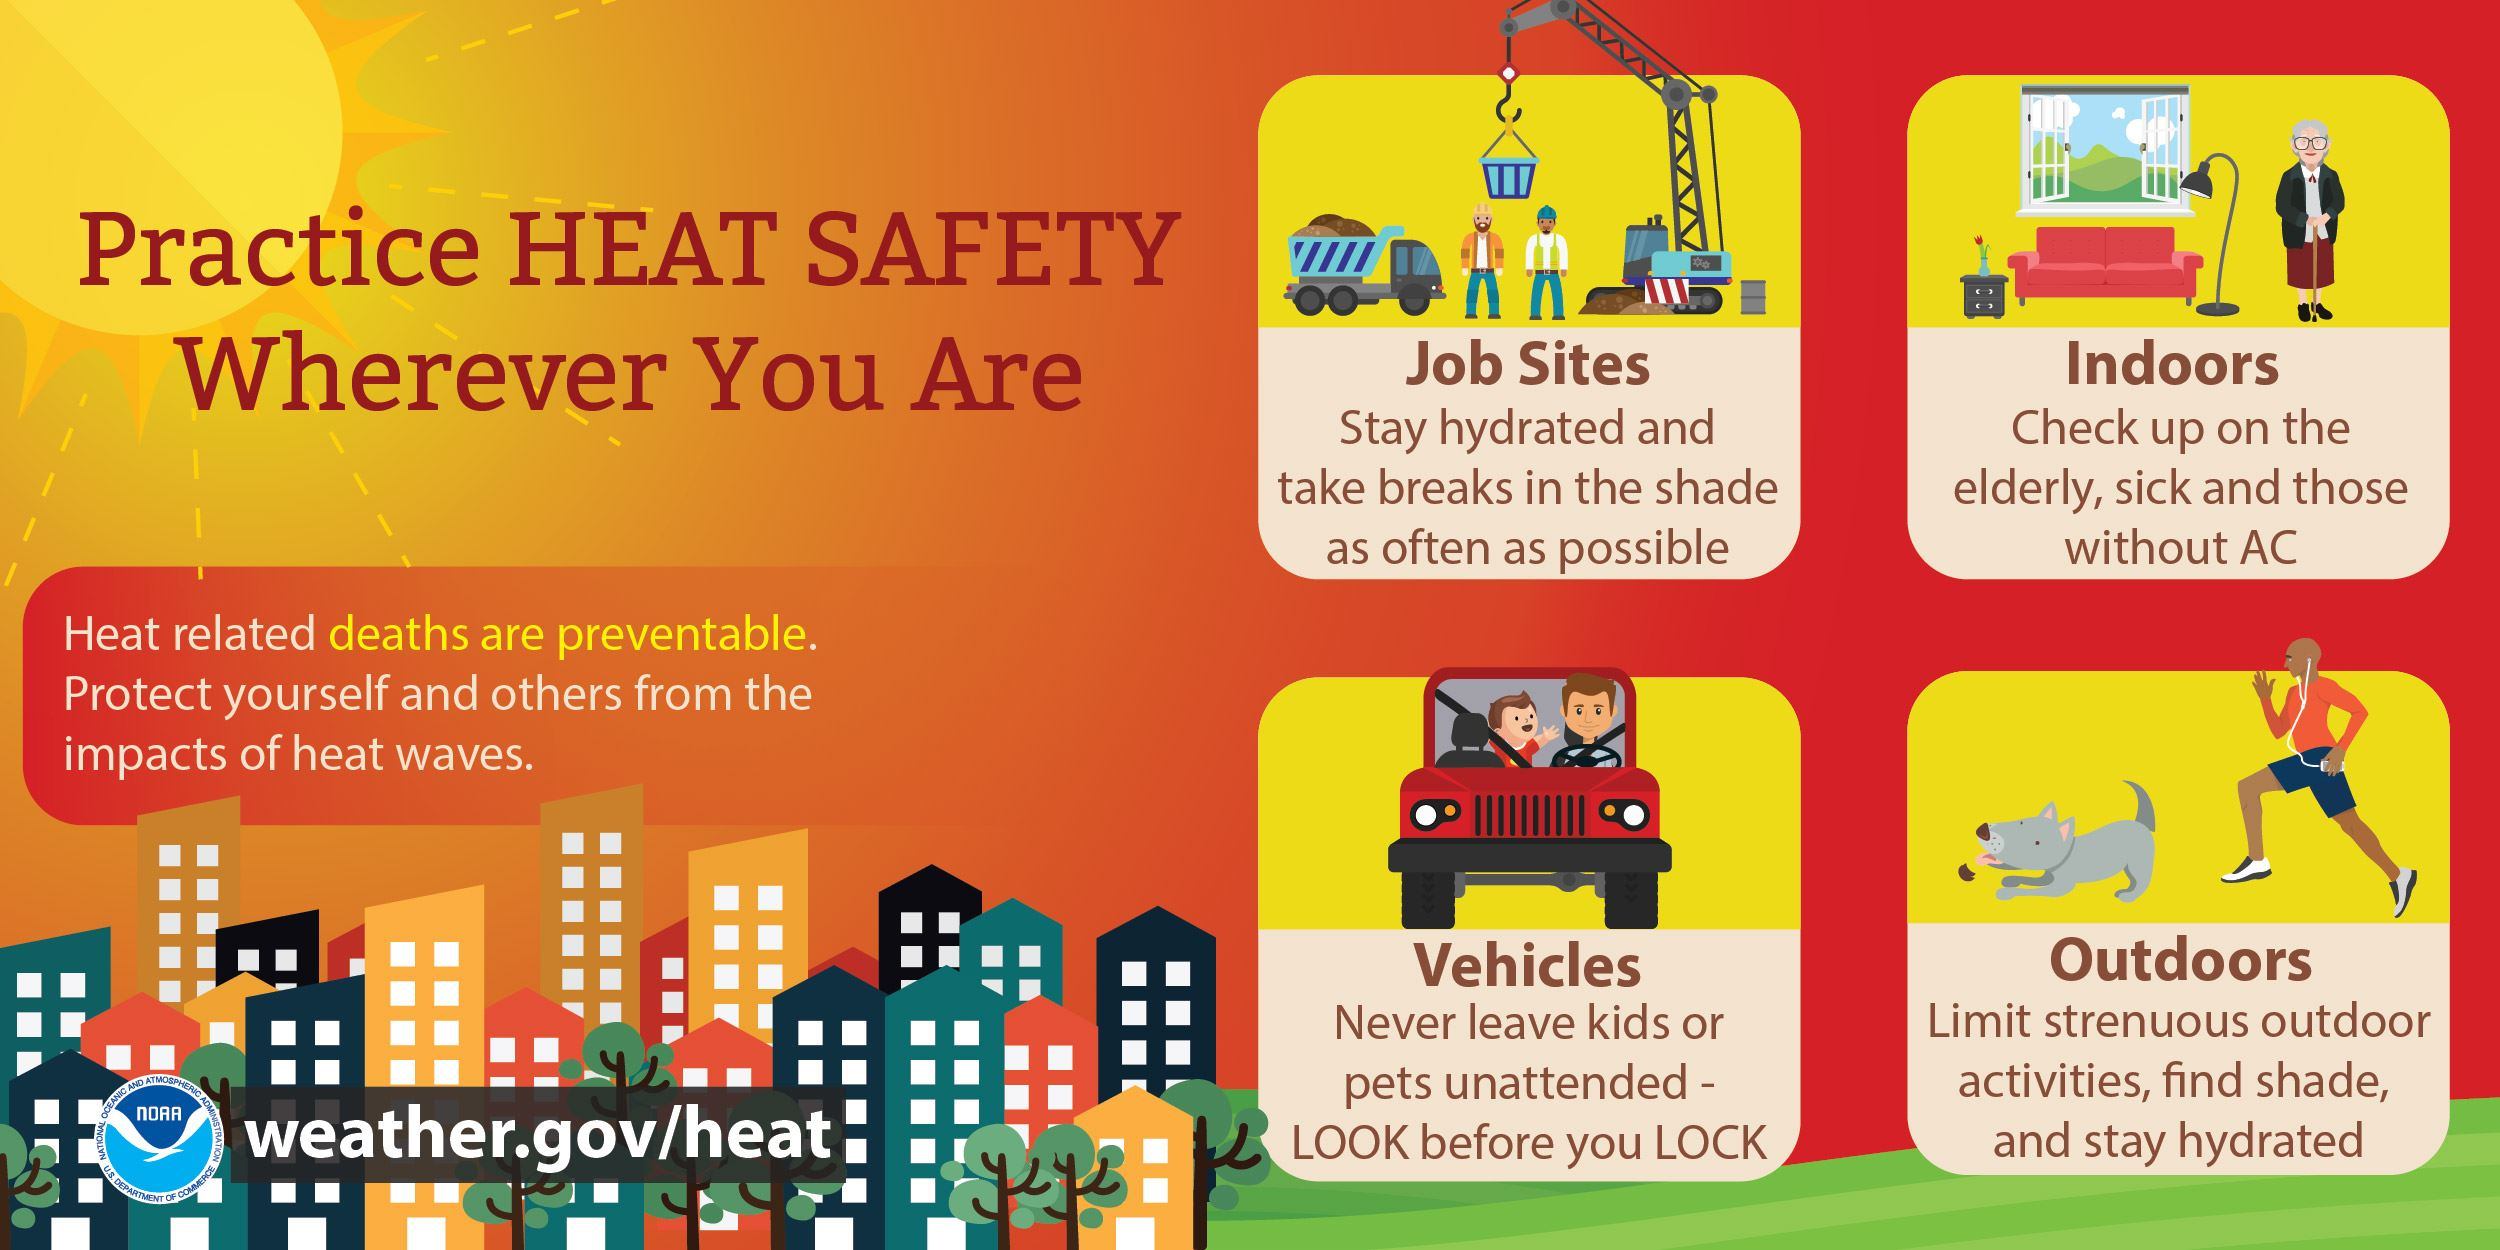 practice_heat_safety